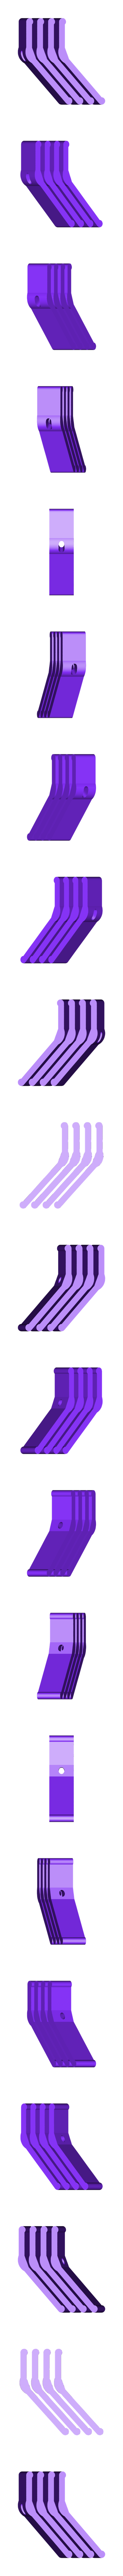 HOLD_DOWN_2_GROUP-OF-4.stl Télécharger fichier STL gratuit Reversable Hold-Down for T-Slot Tables • Objet pour impression 3D, WorksBySolo